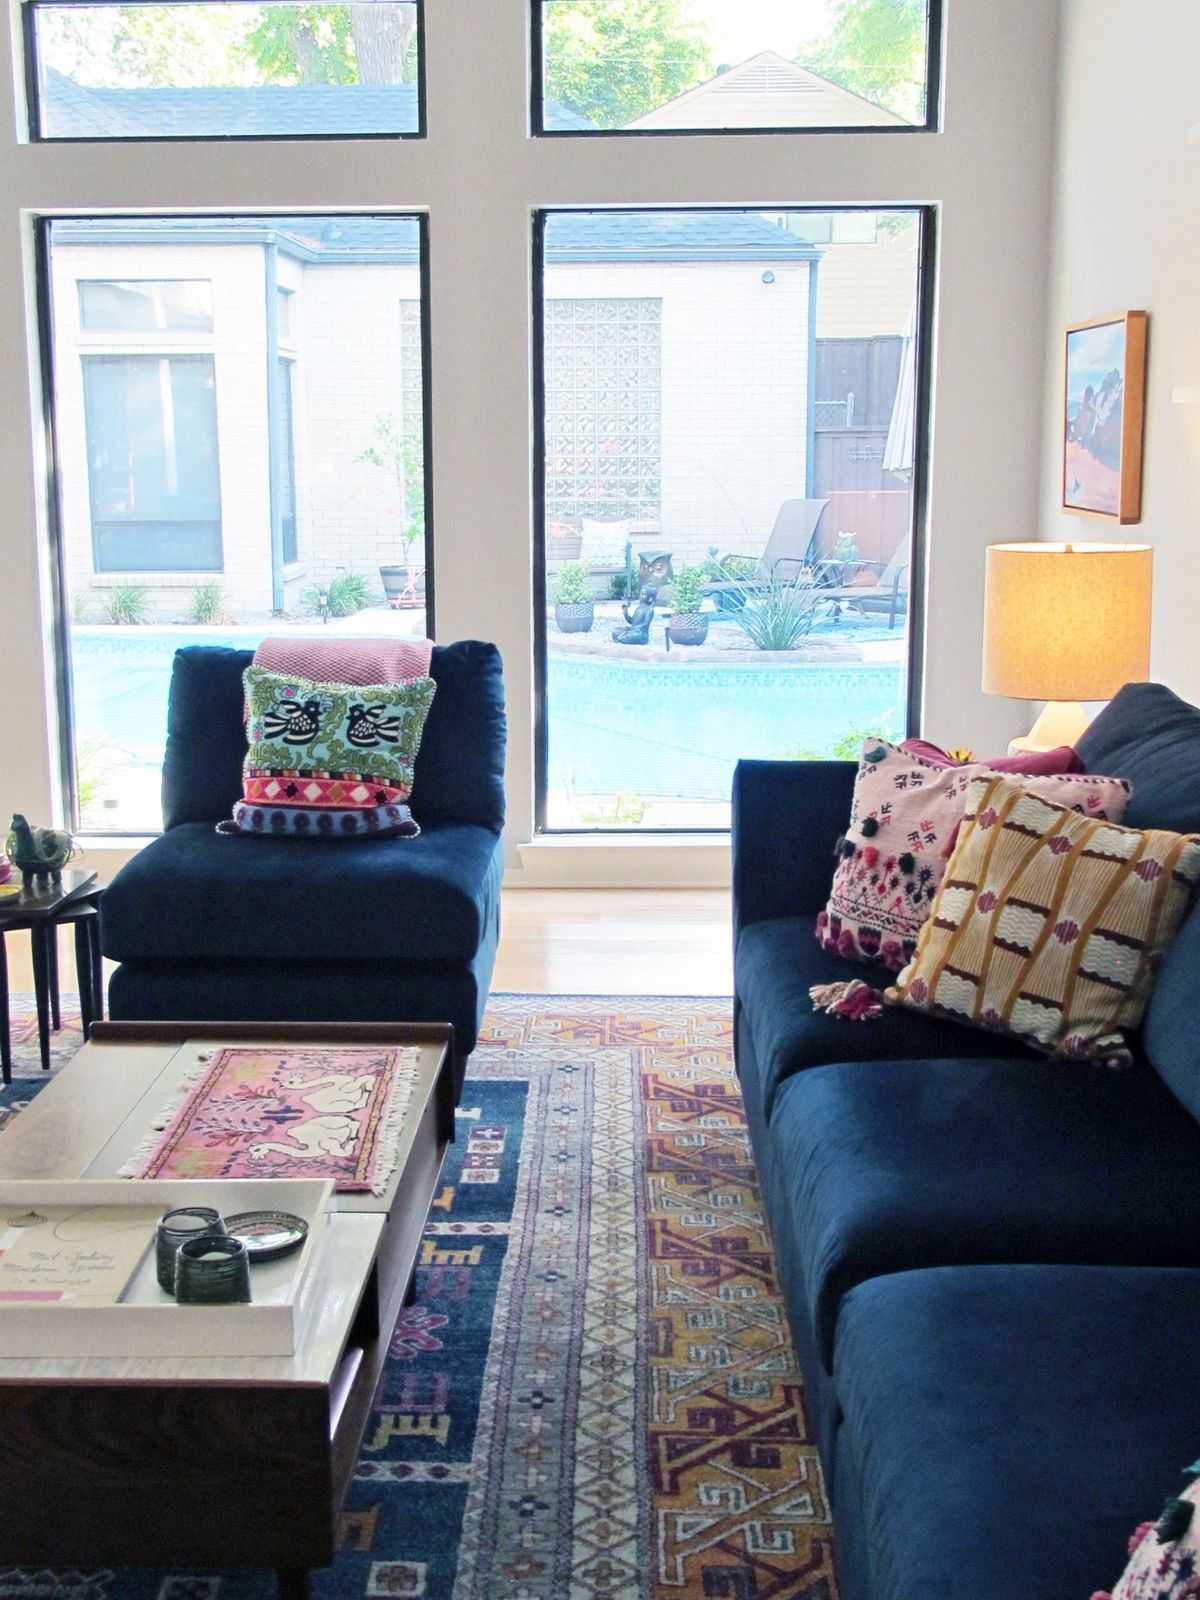 Kirkpatrick Contemporary Home Photo Video Shoot Location Dallas 09.jpg